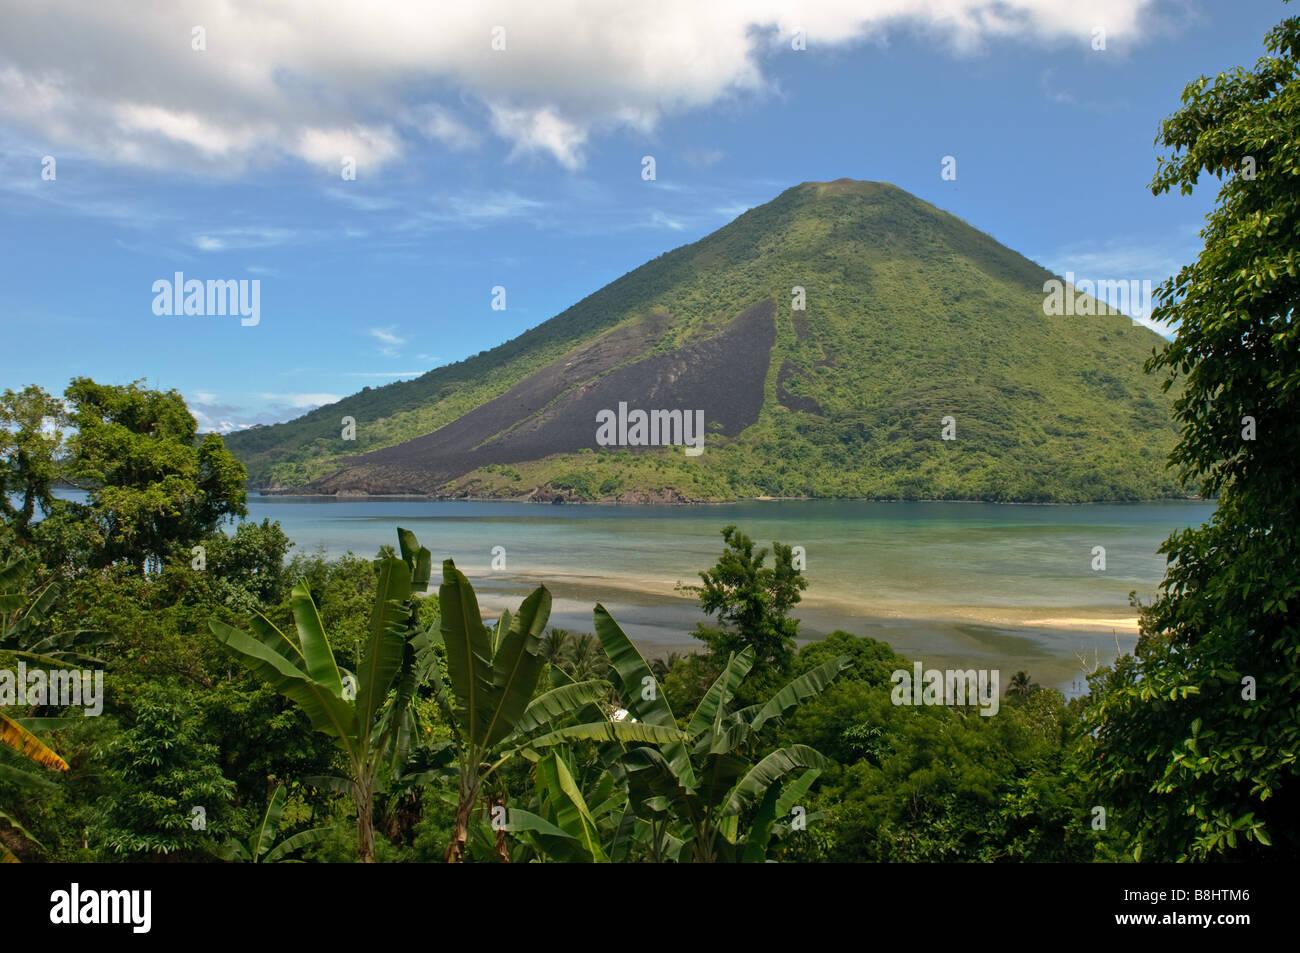 Gunung Api vulcano isole Banda Indonesia Immagini Stock